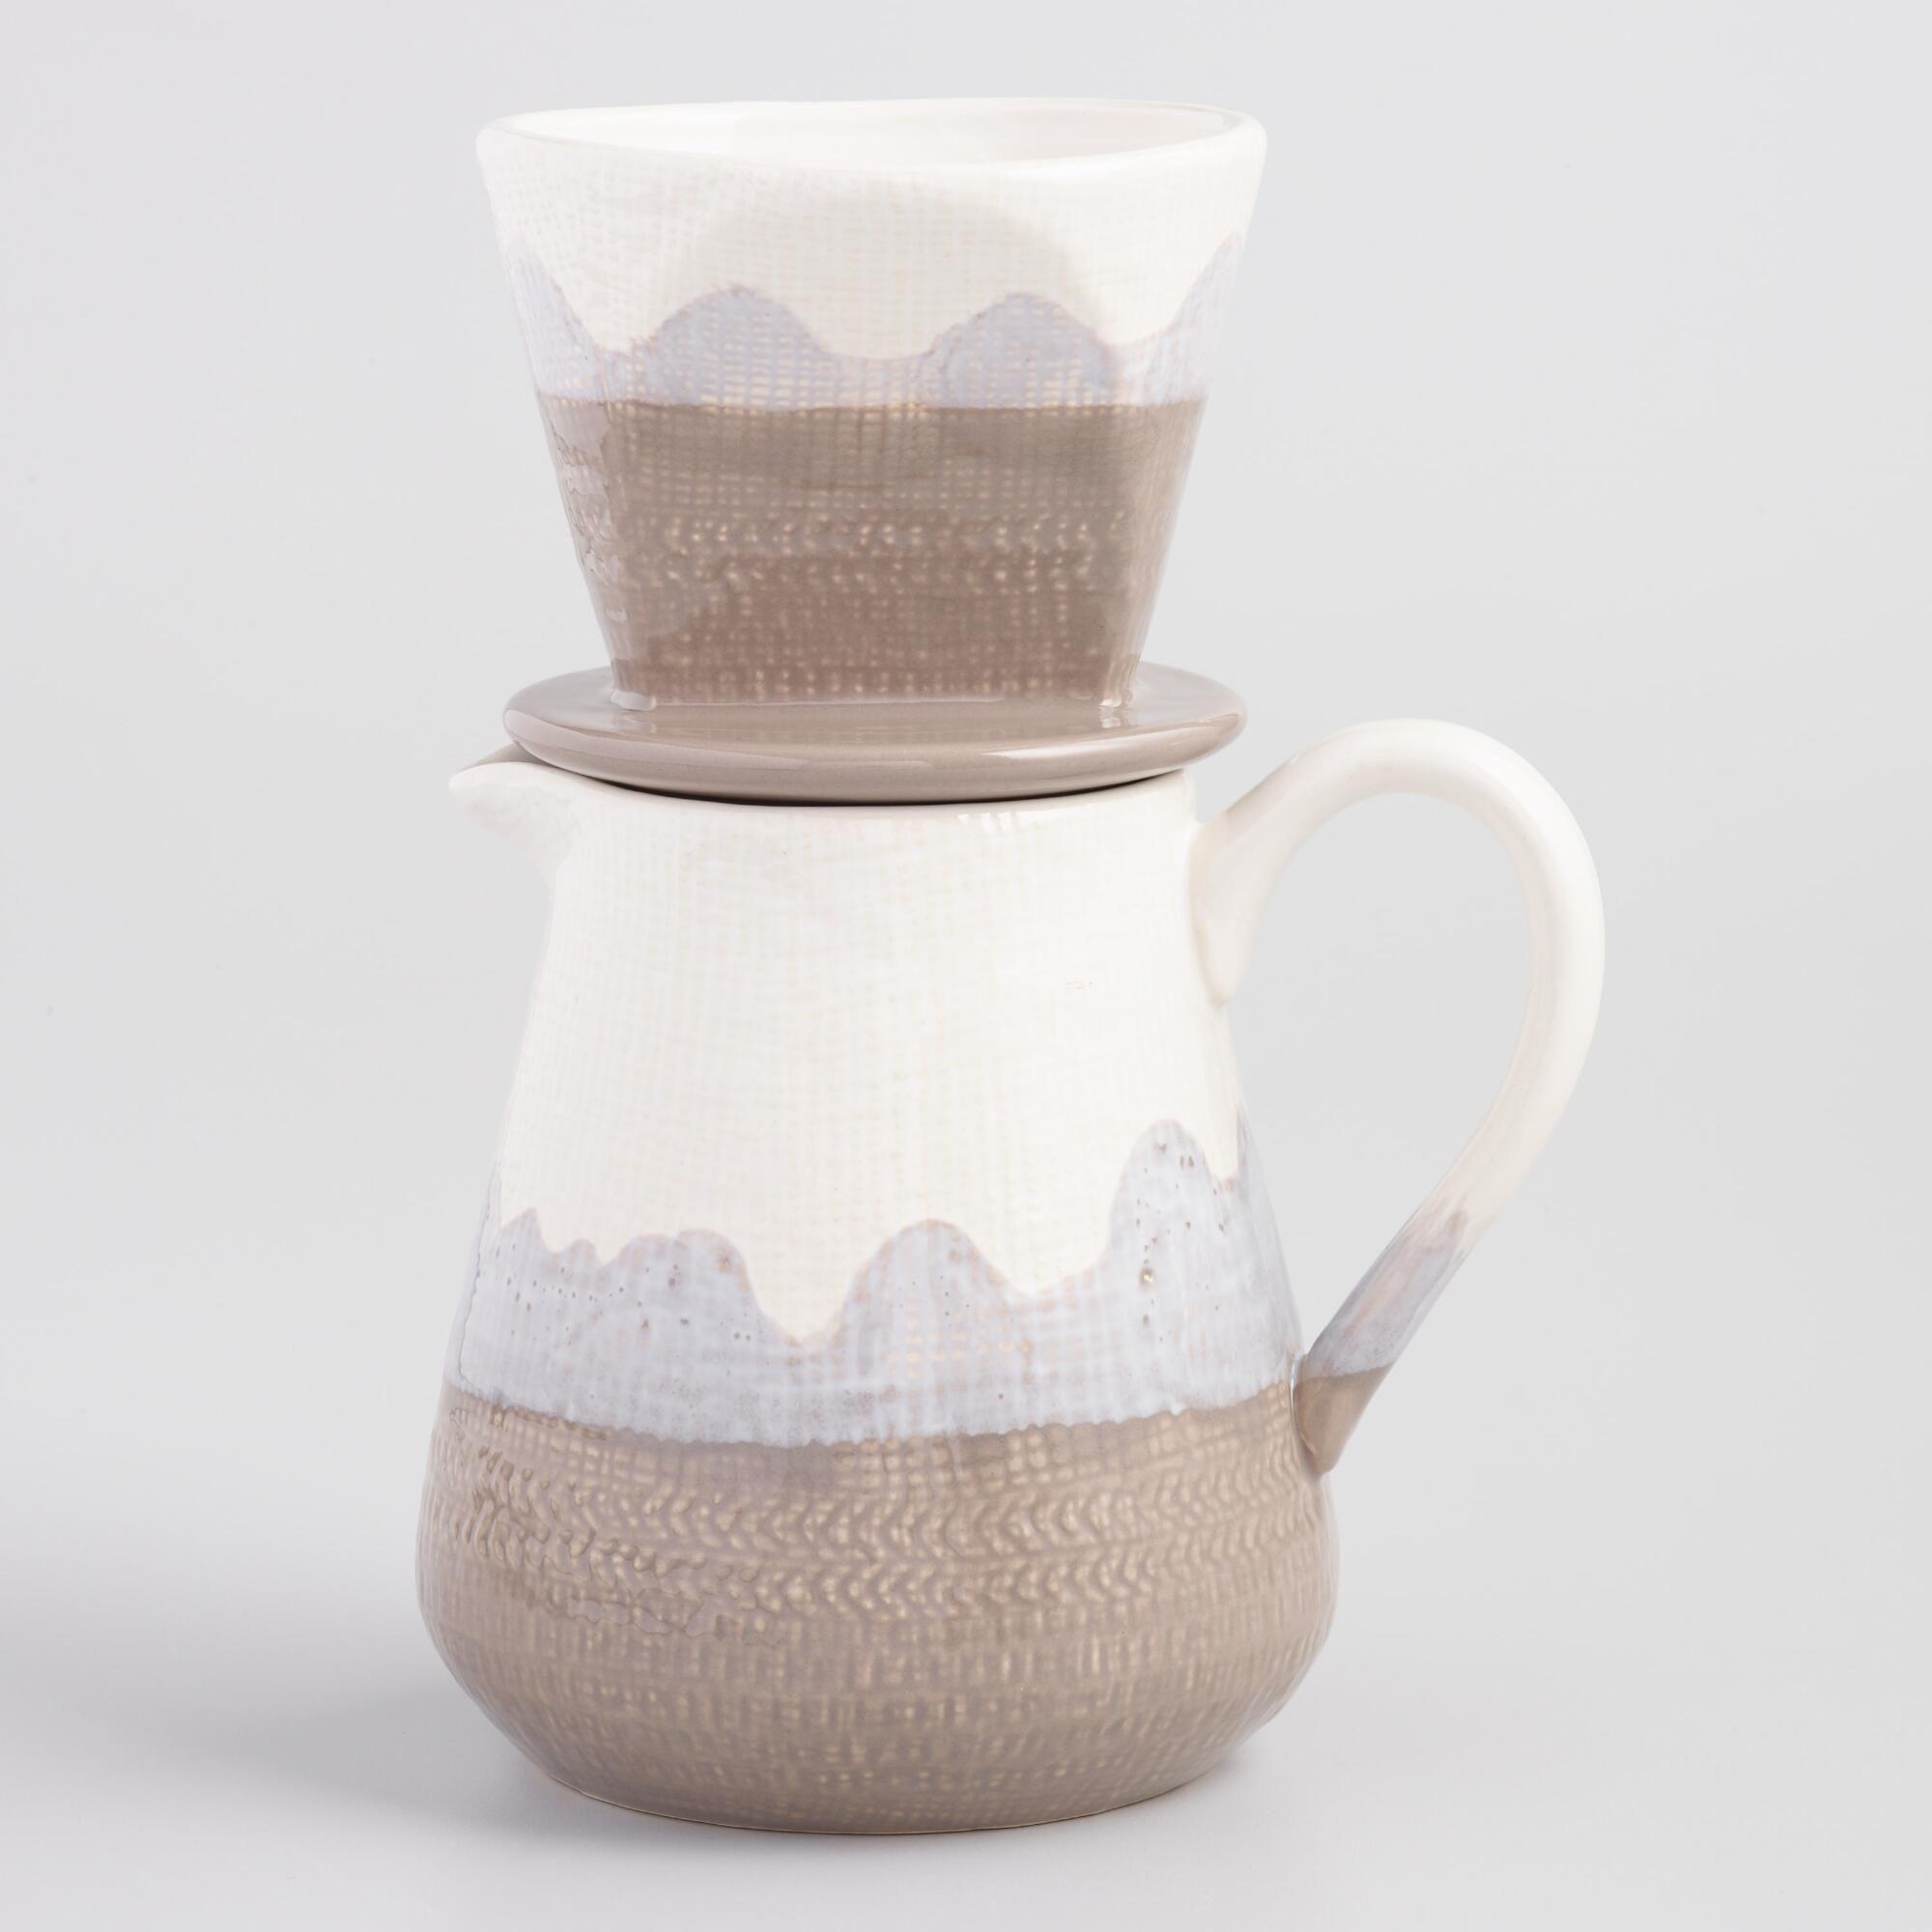 Large Gray Reactive Glaze Ceramic Pour Over Coffee Maker